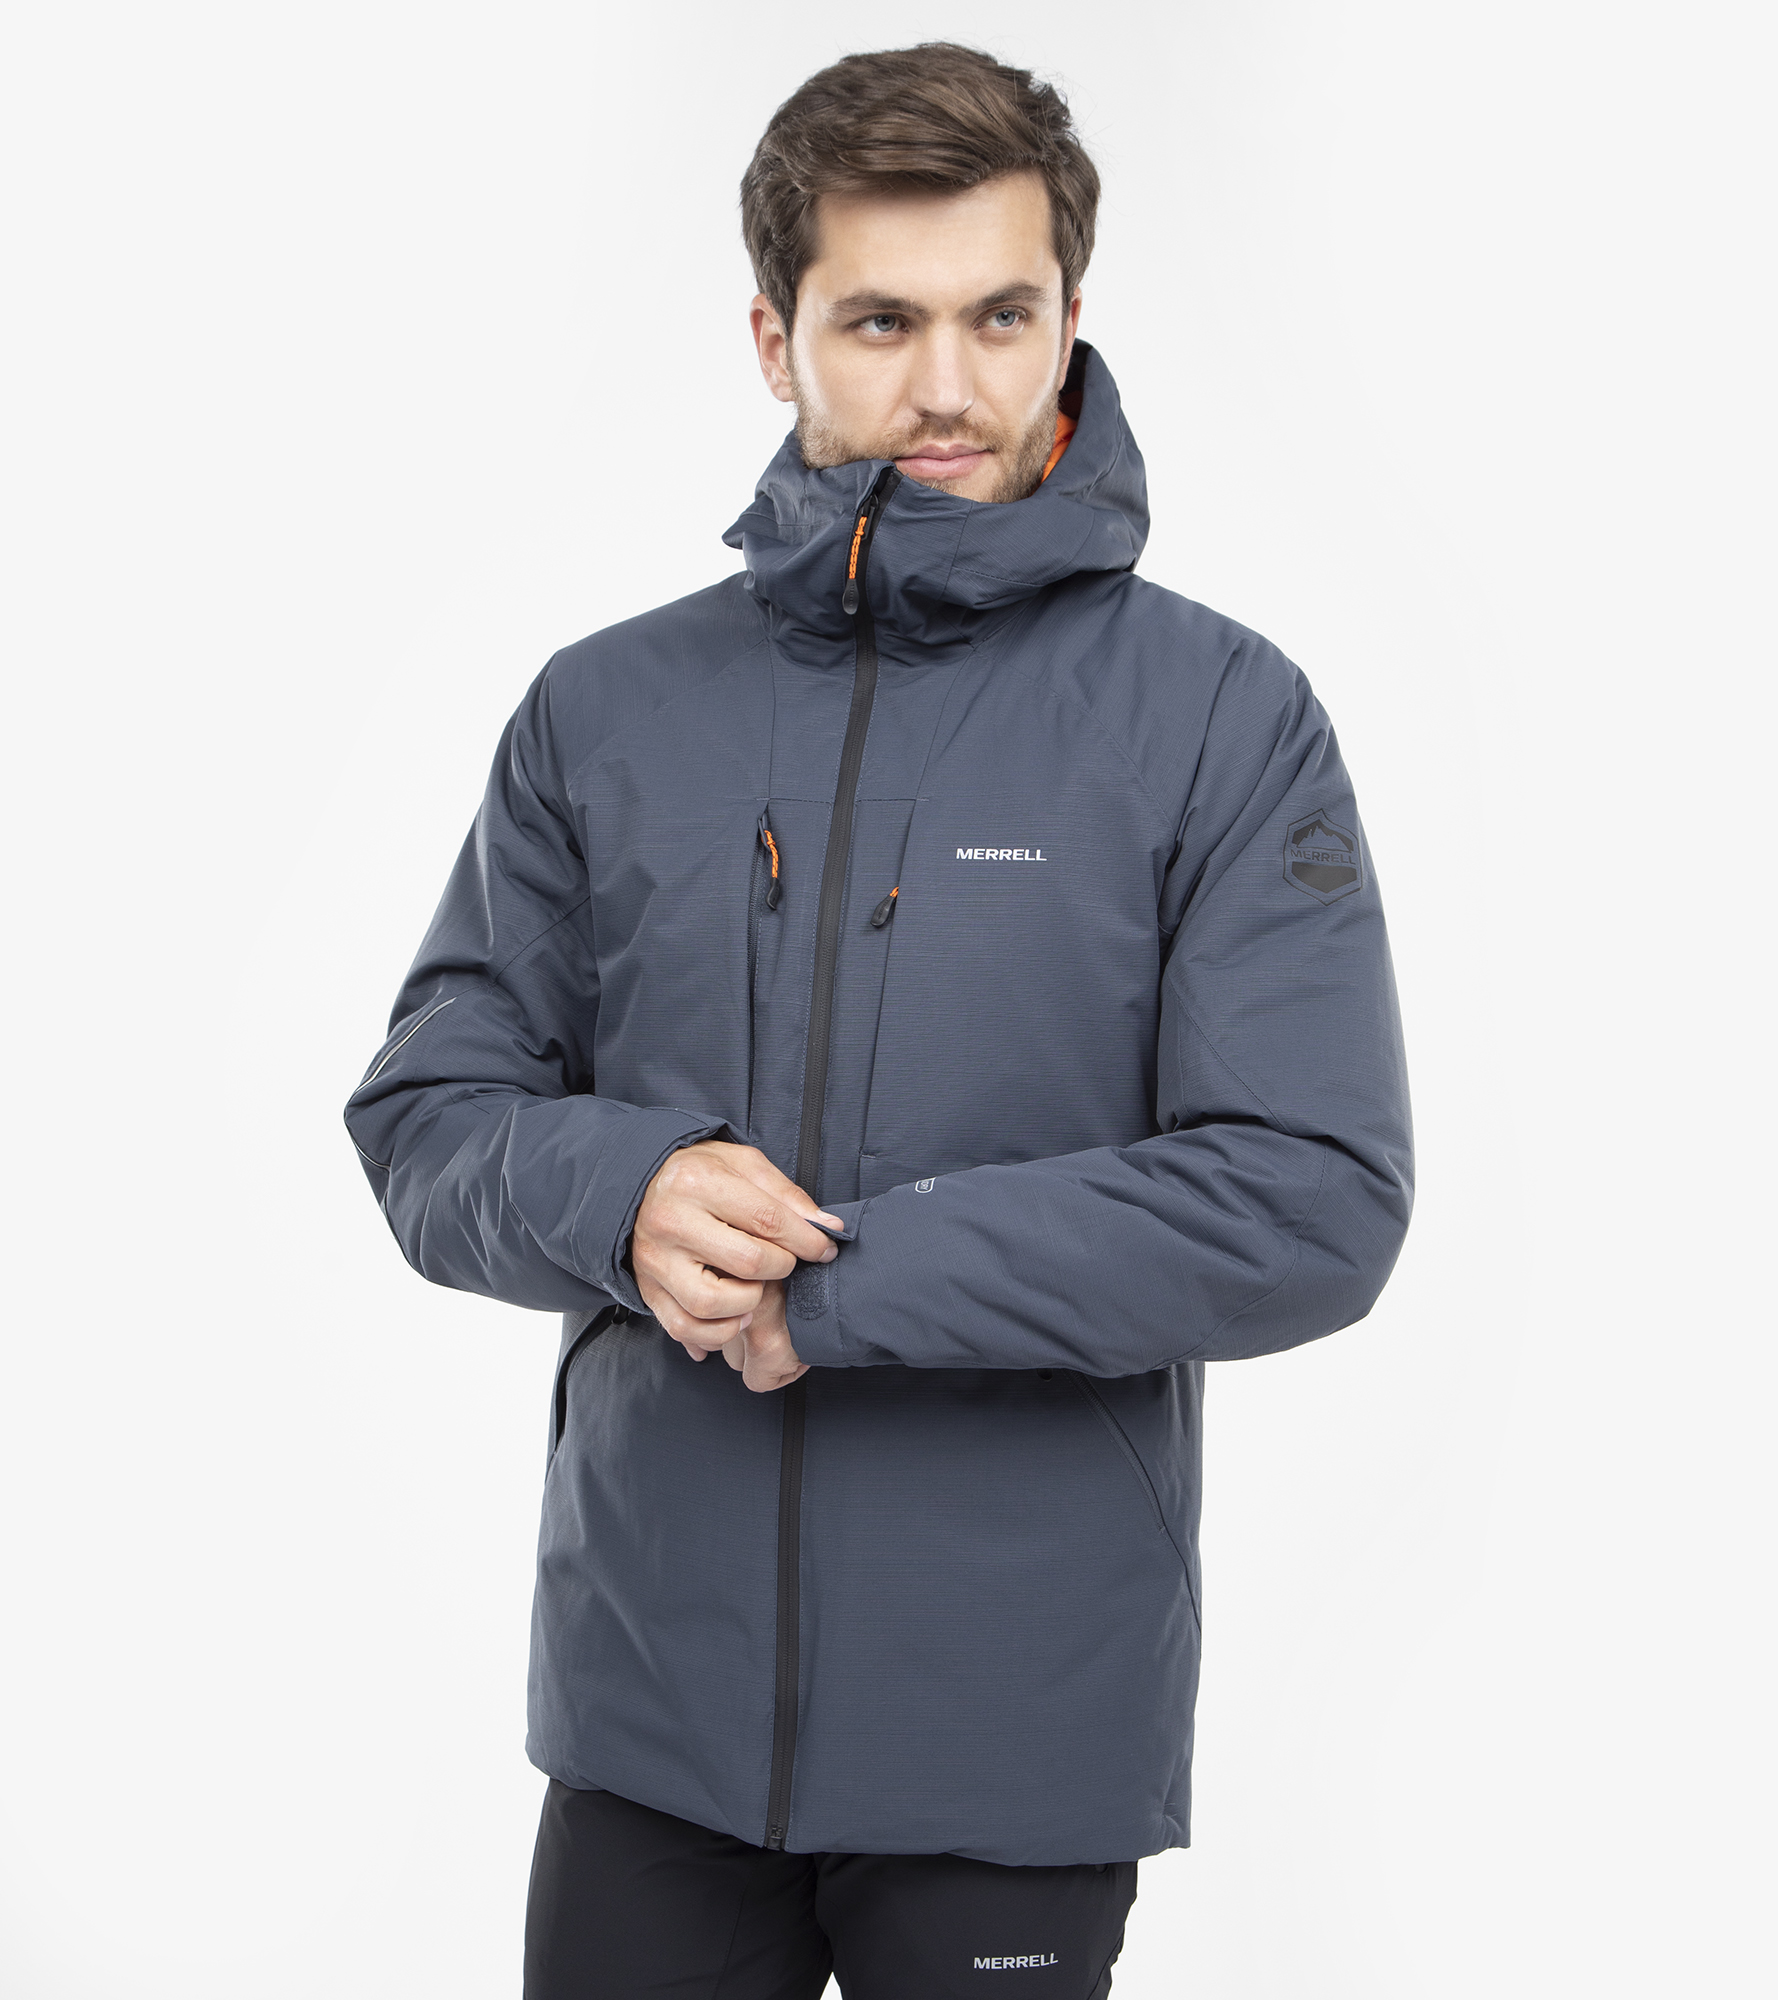 купить Merrell Куртка утепленная мужская Merrell, размер 58 по цене 10999 рублей